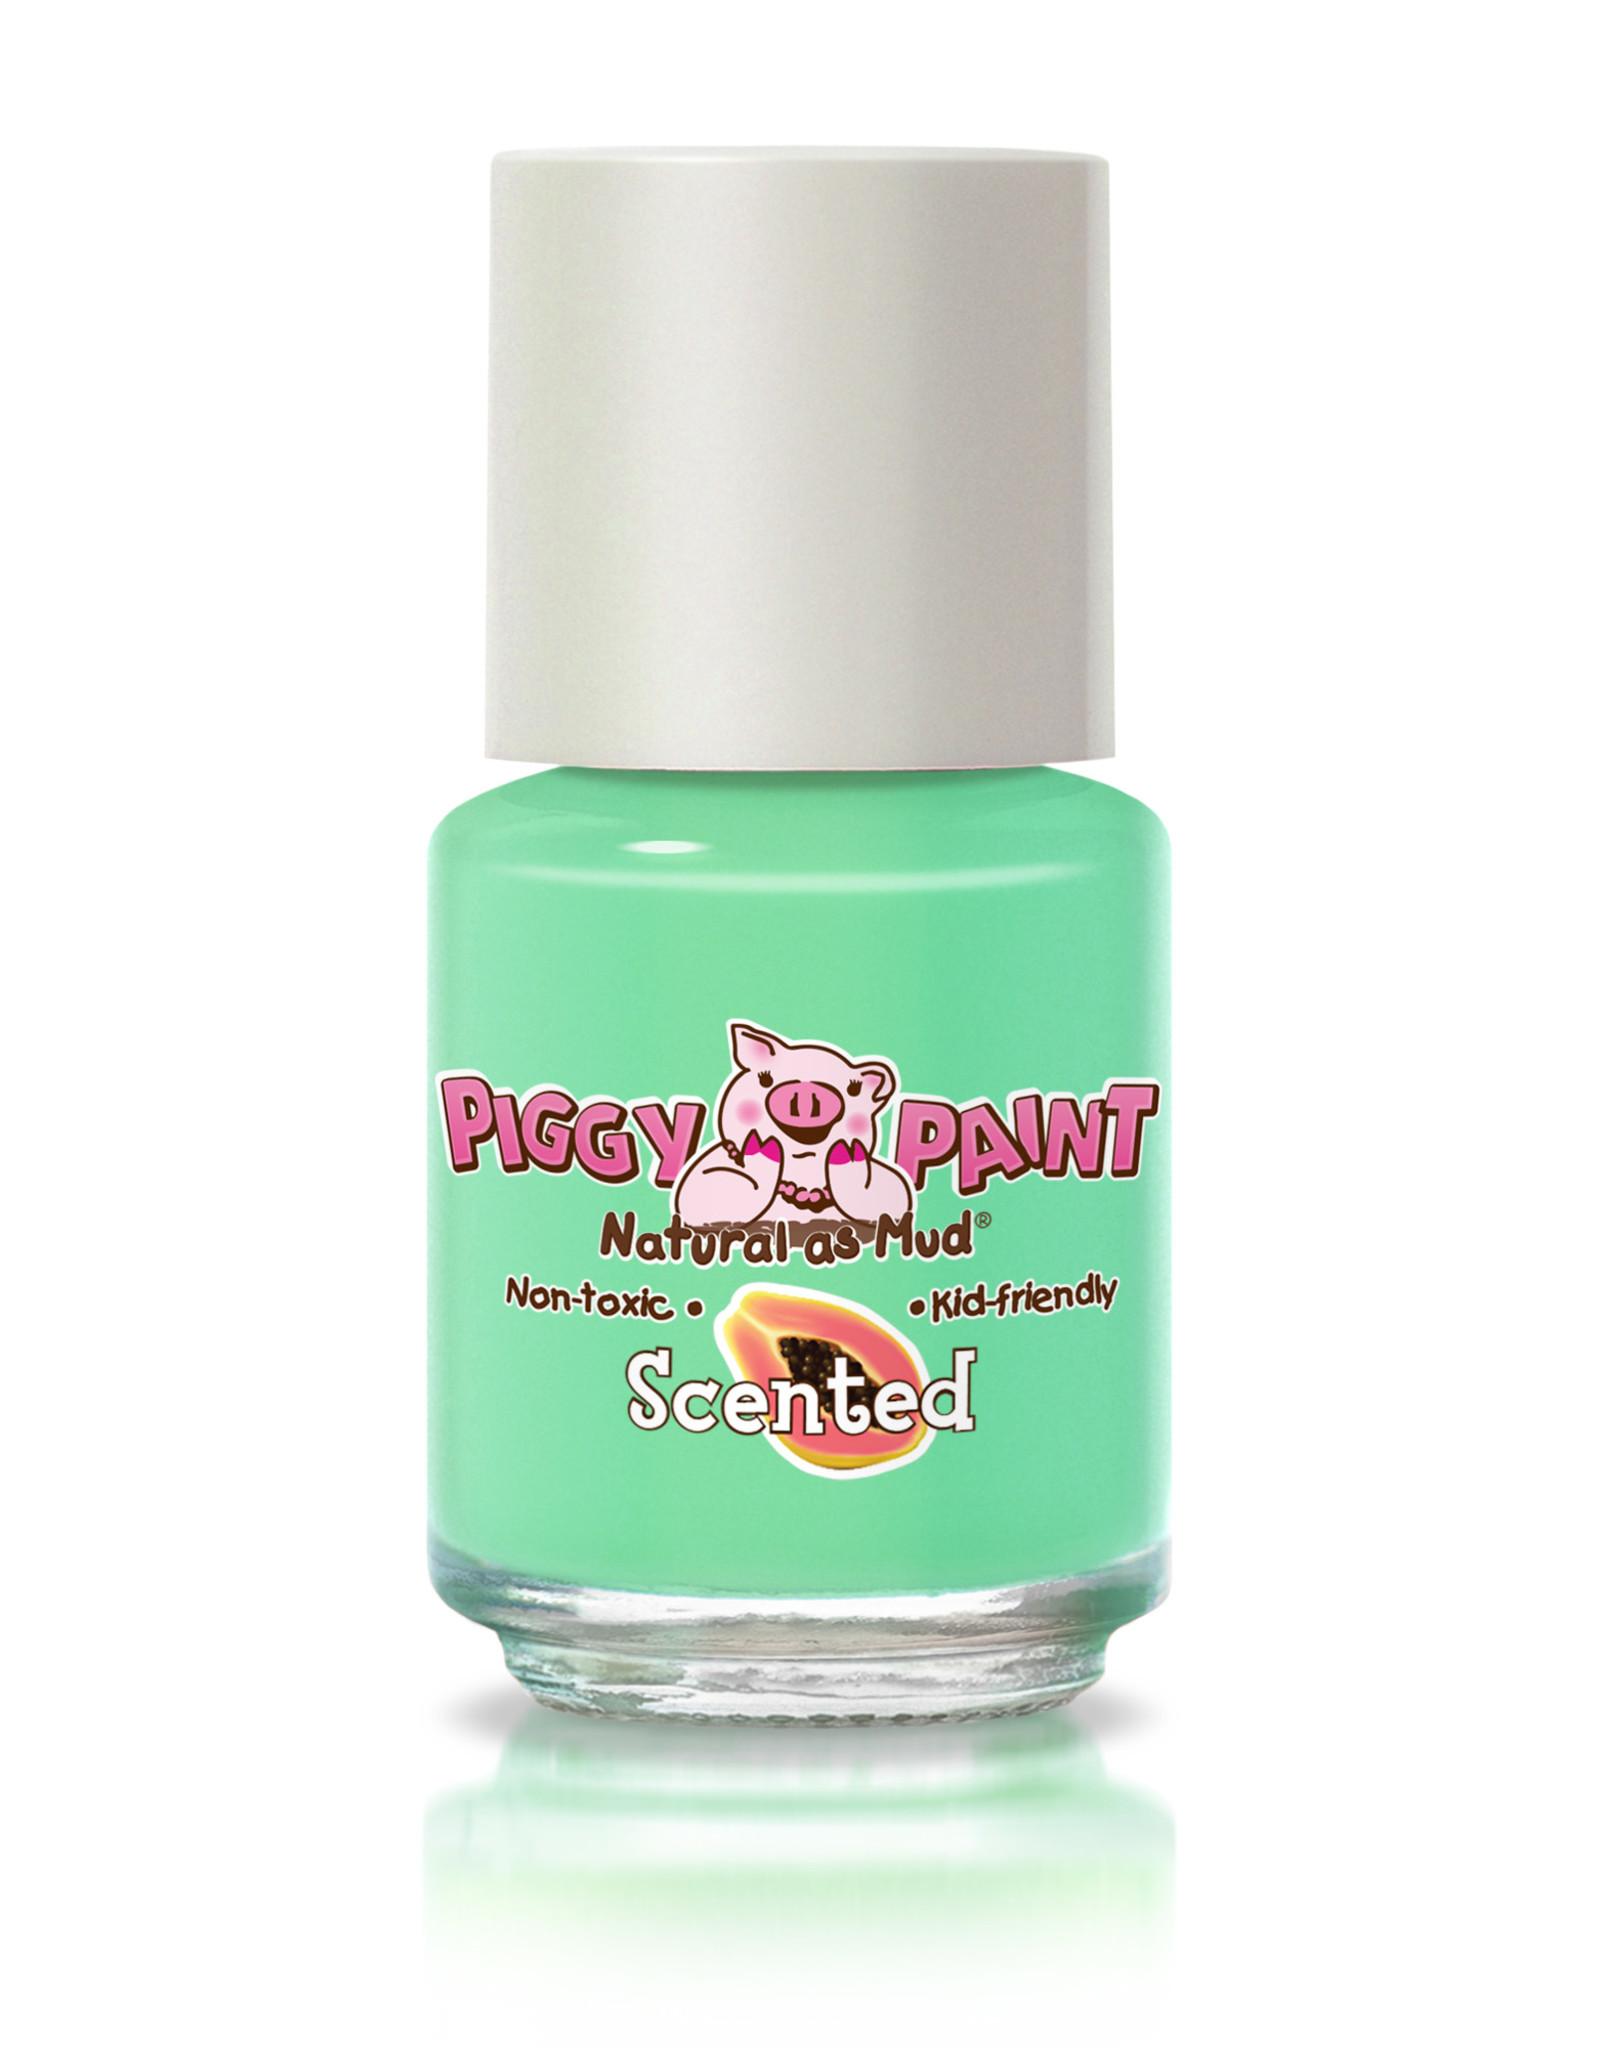 Piggy Paint Scented Nail Polish - Papaya Party